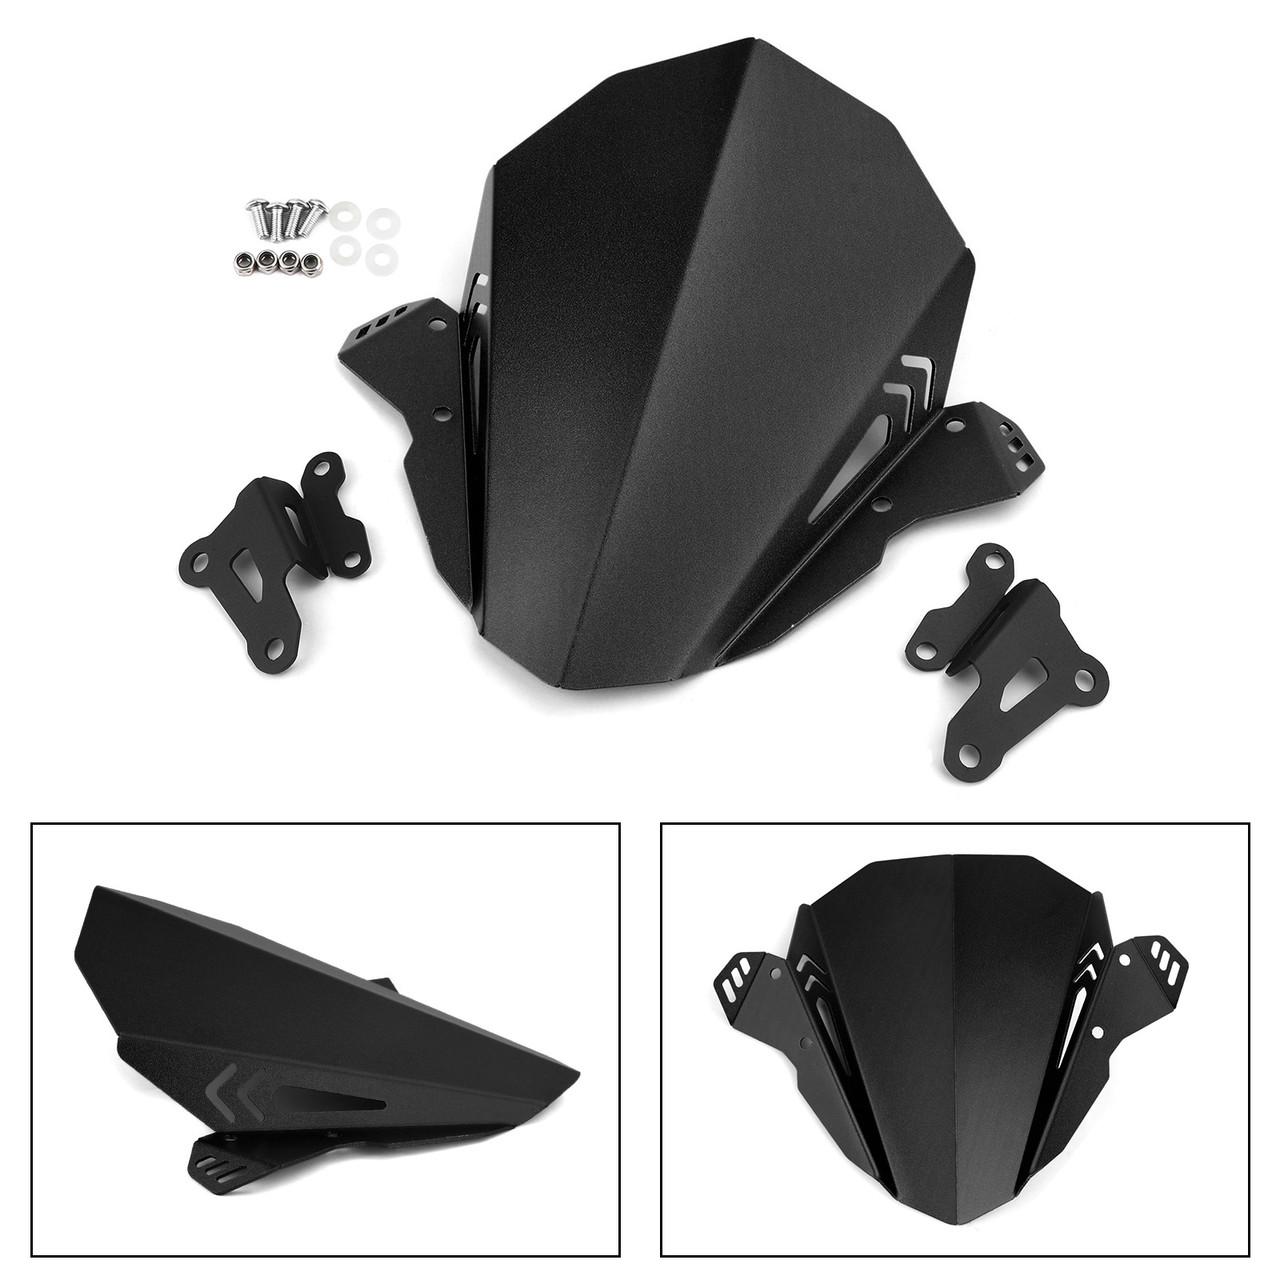 Aluminum Windshield Fit For YAMAHA MT-09 FZ-09 19-20 Black